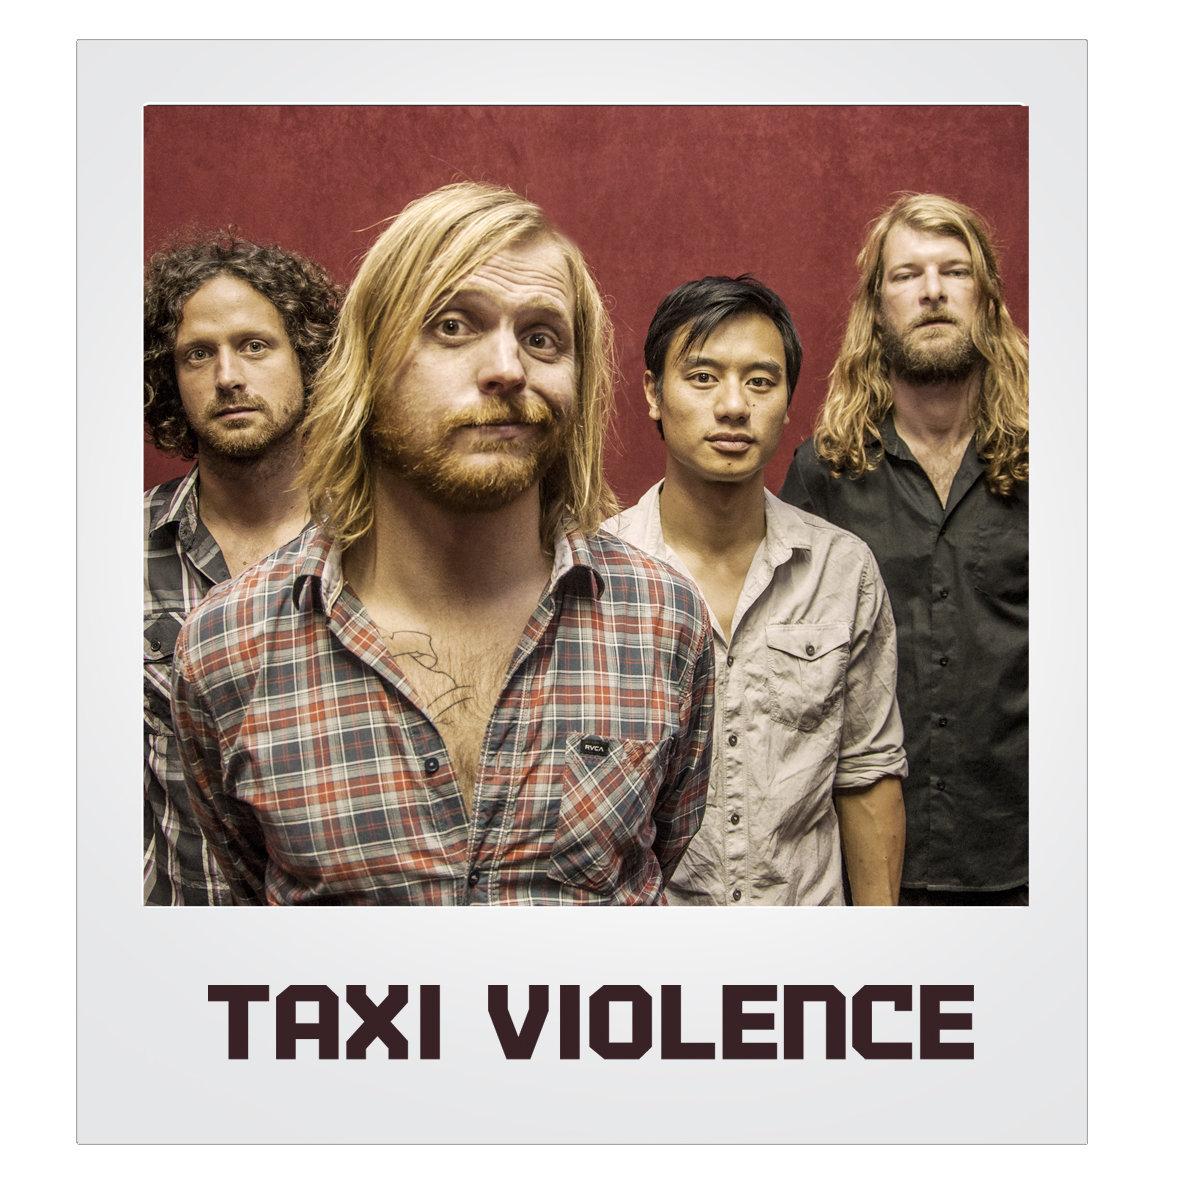 Taxi violence: heads or tails, 2011 - всё о фильме - кинопоиск+